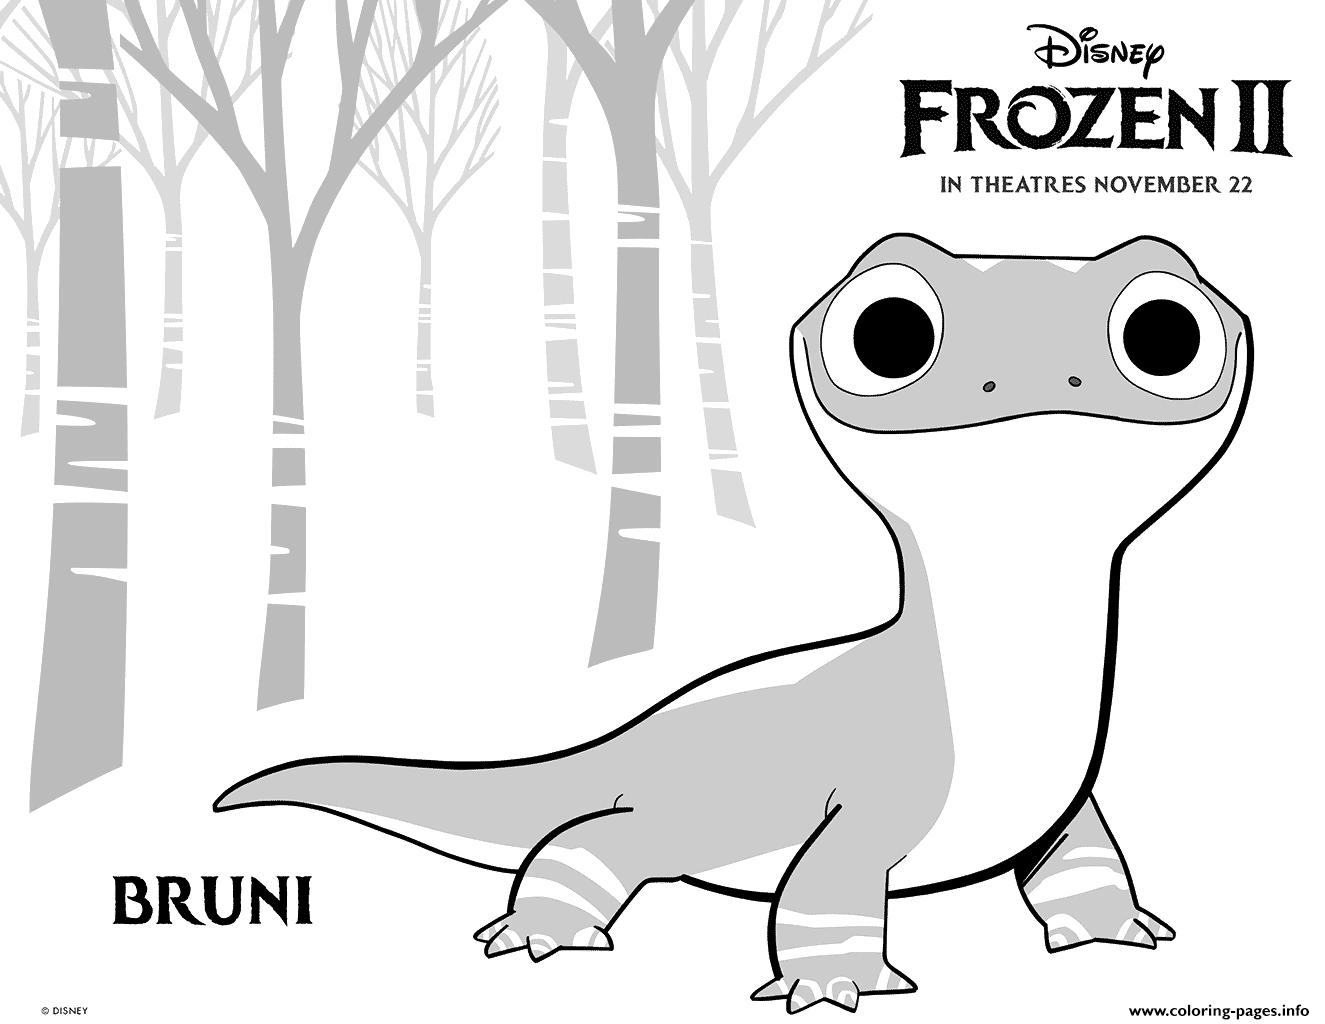 Disney Frozen 2 Bruni Salamander Coloring Pages Printable